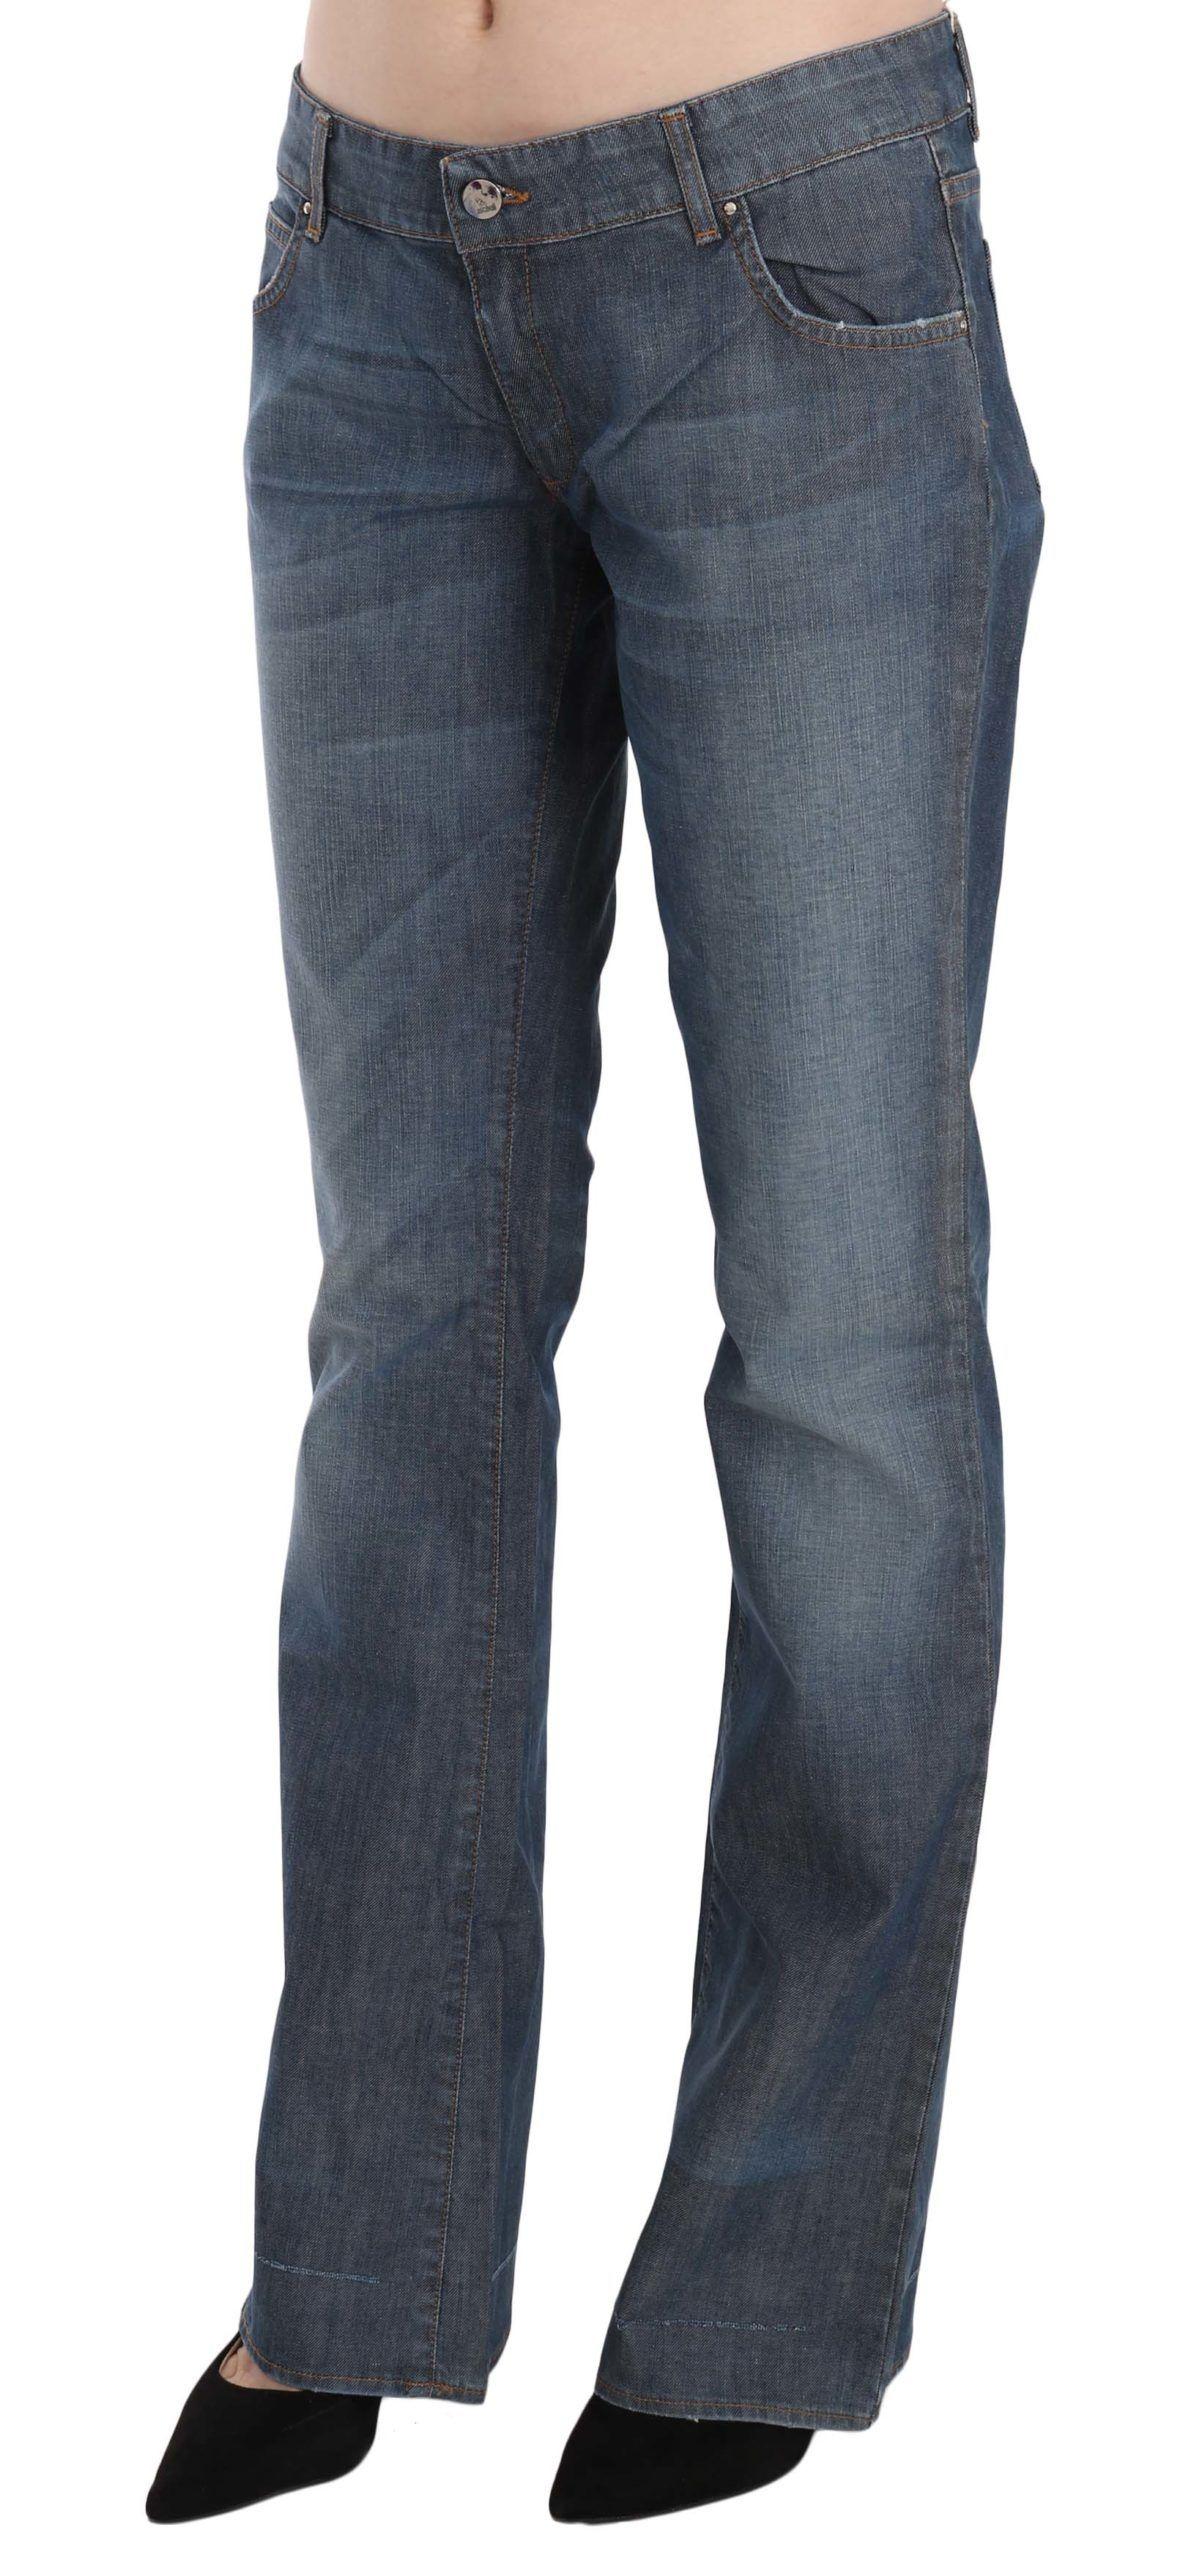 Just Cavalli Blue Washed Low Waist Cotton Straight Denim Pants